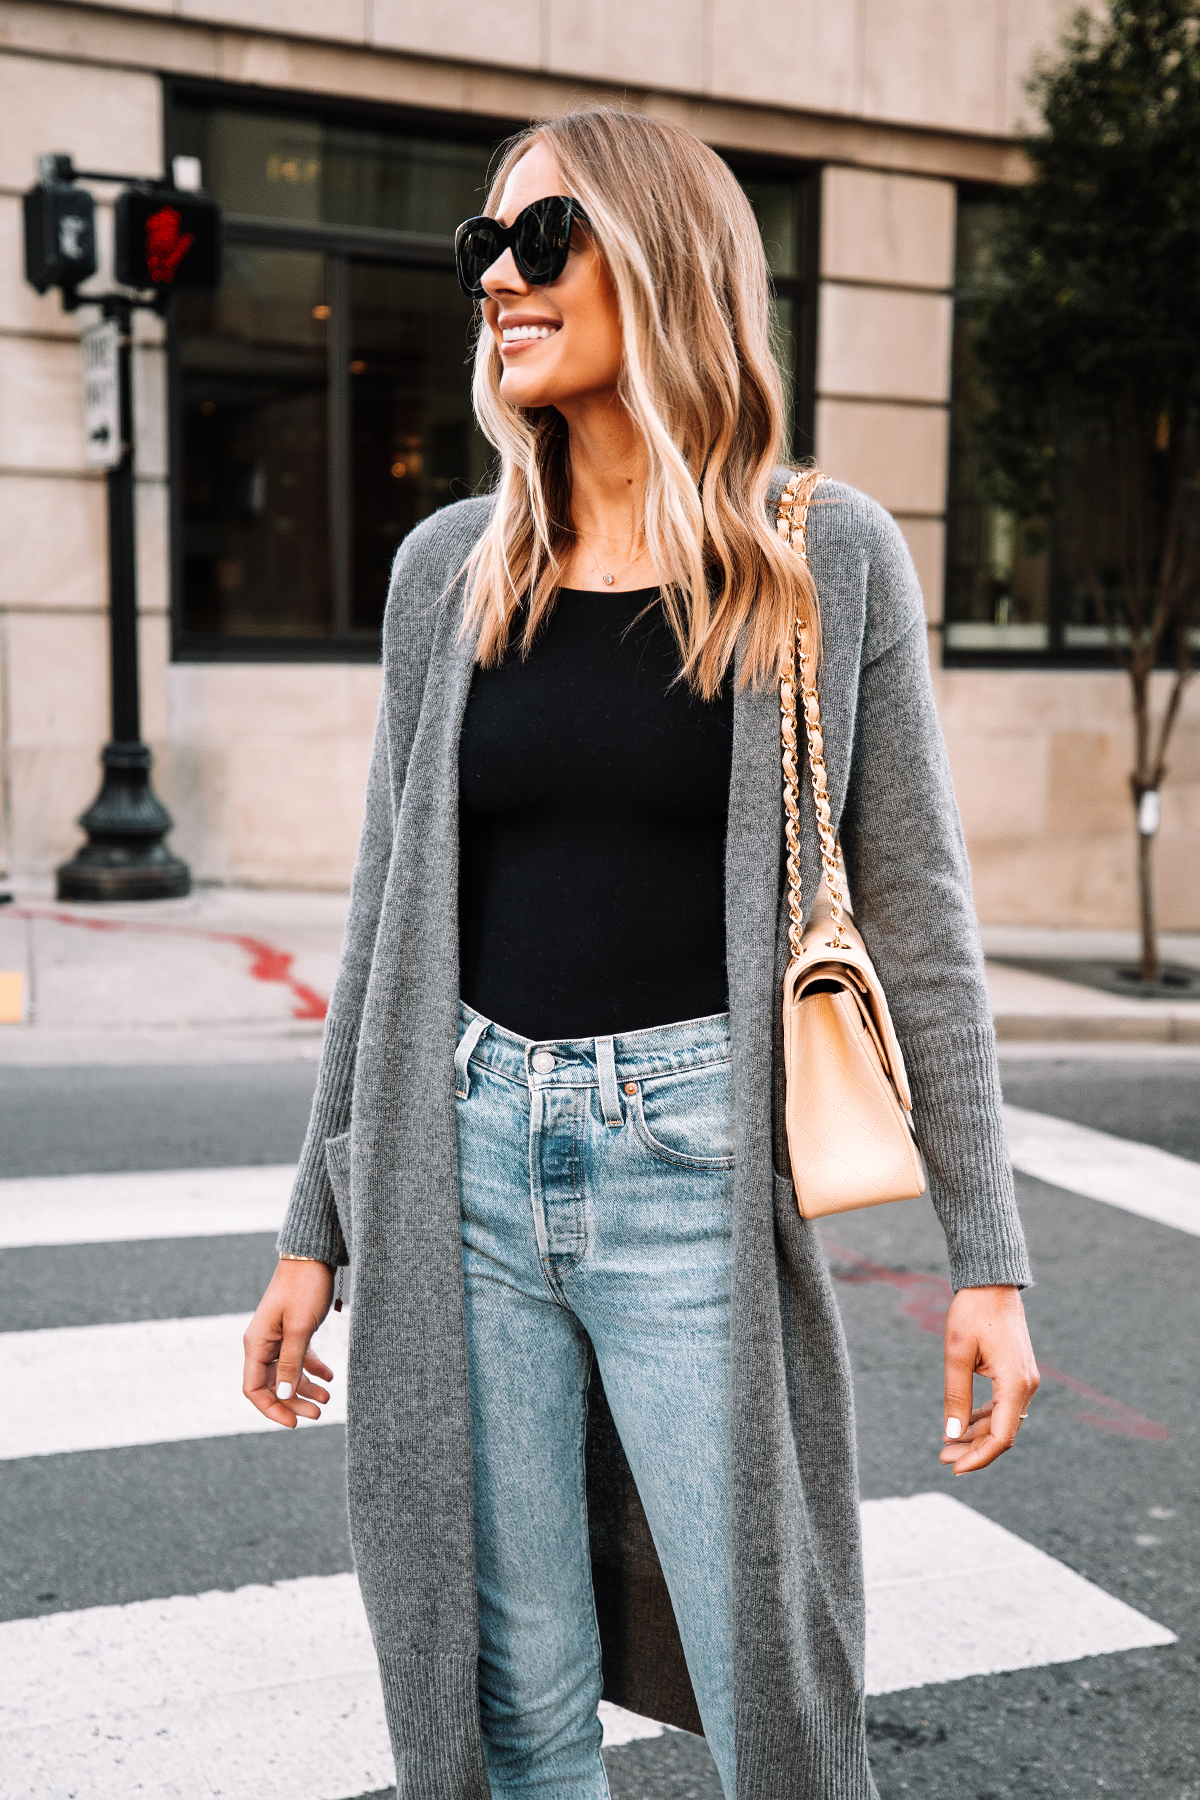 Fashion Jackson Wearing Long Grey Cardigan Black Bodysuit Levis 501 Jeans Chanel Jumbo Beige Handbag 1